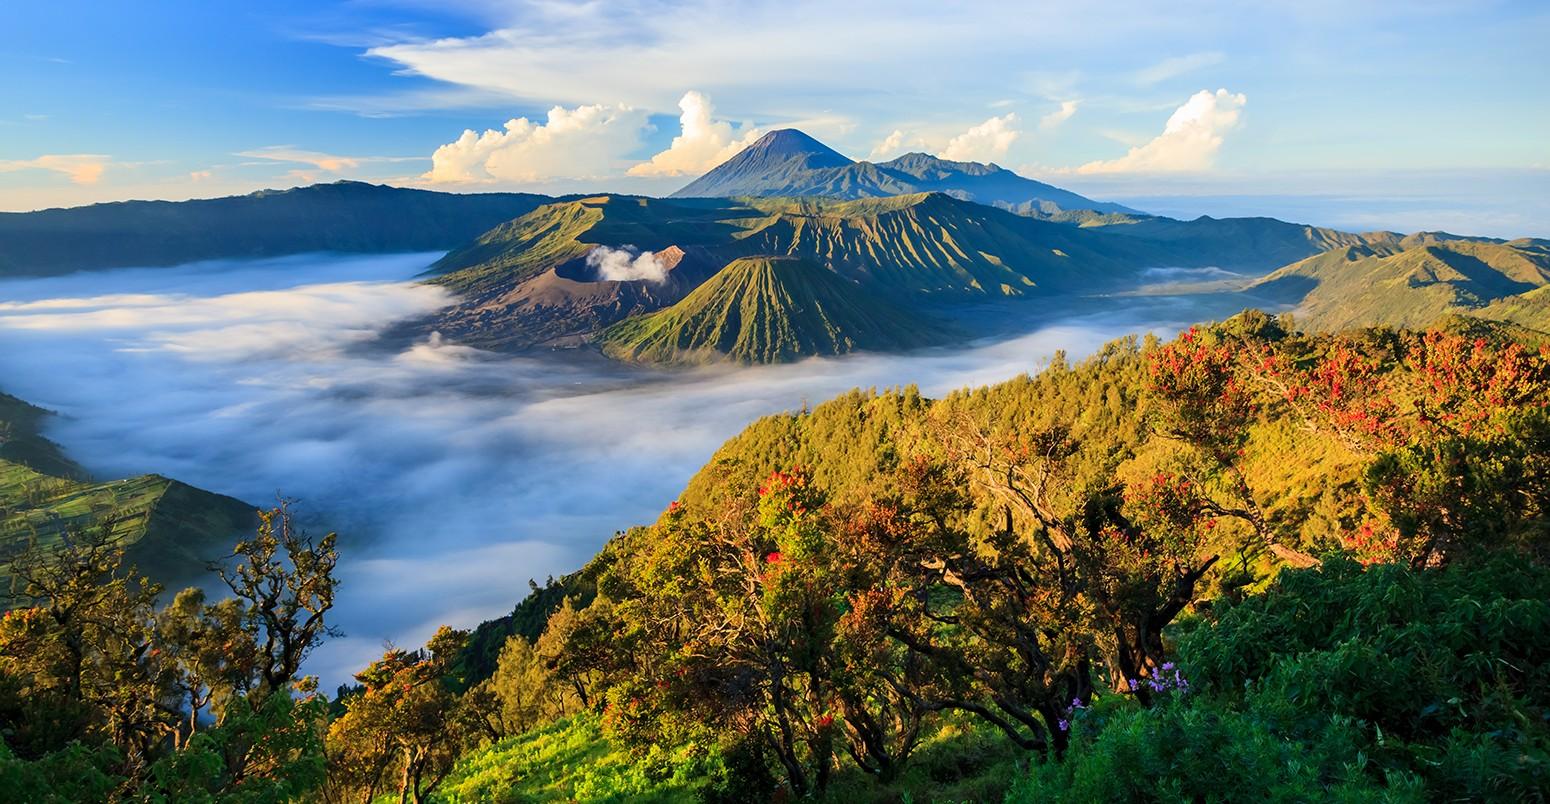 châu Á Java Indonesia